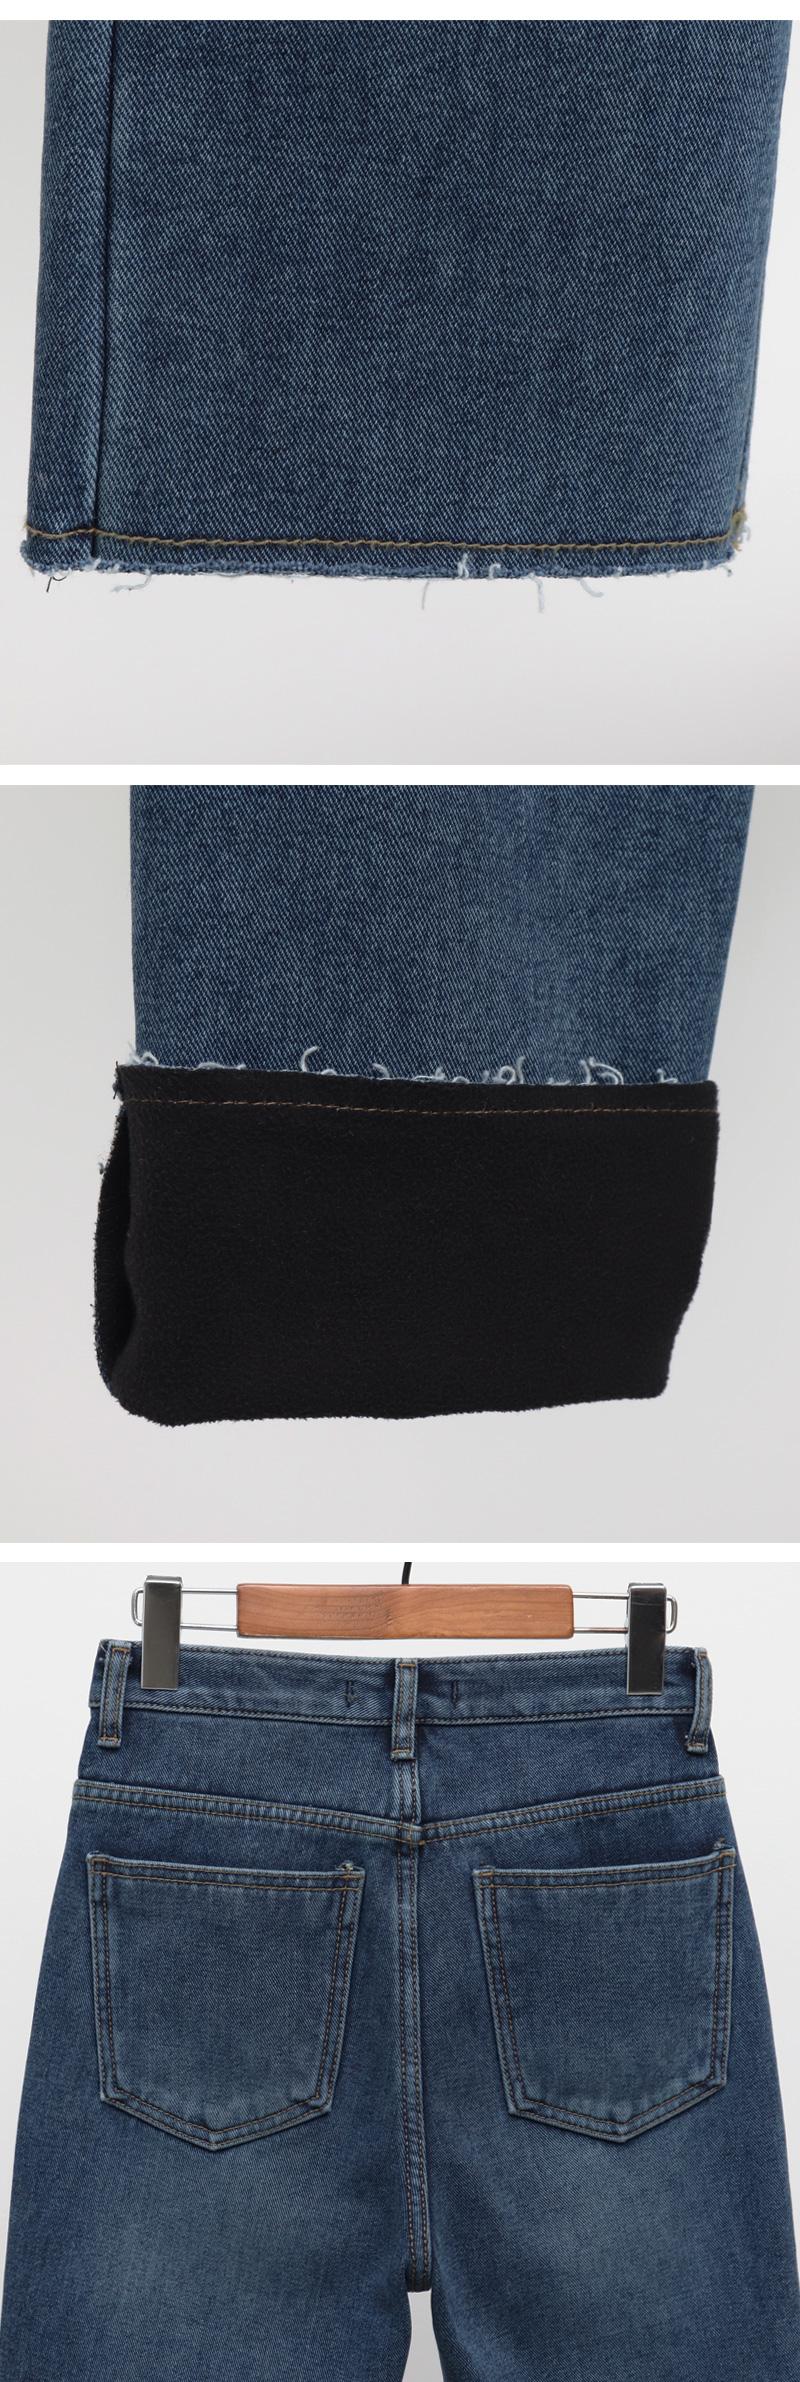 Fleece warm cutting denim_B (size : S,M,L)